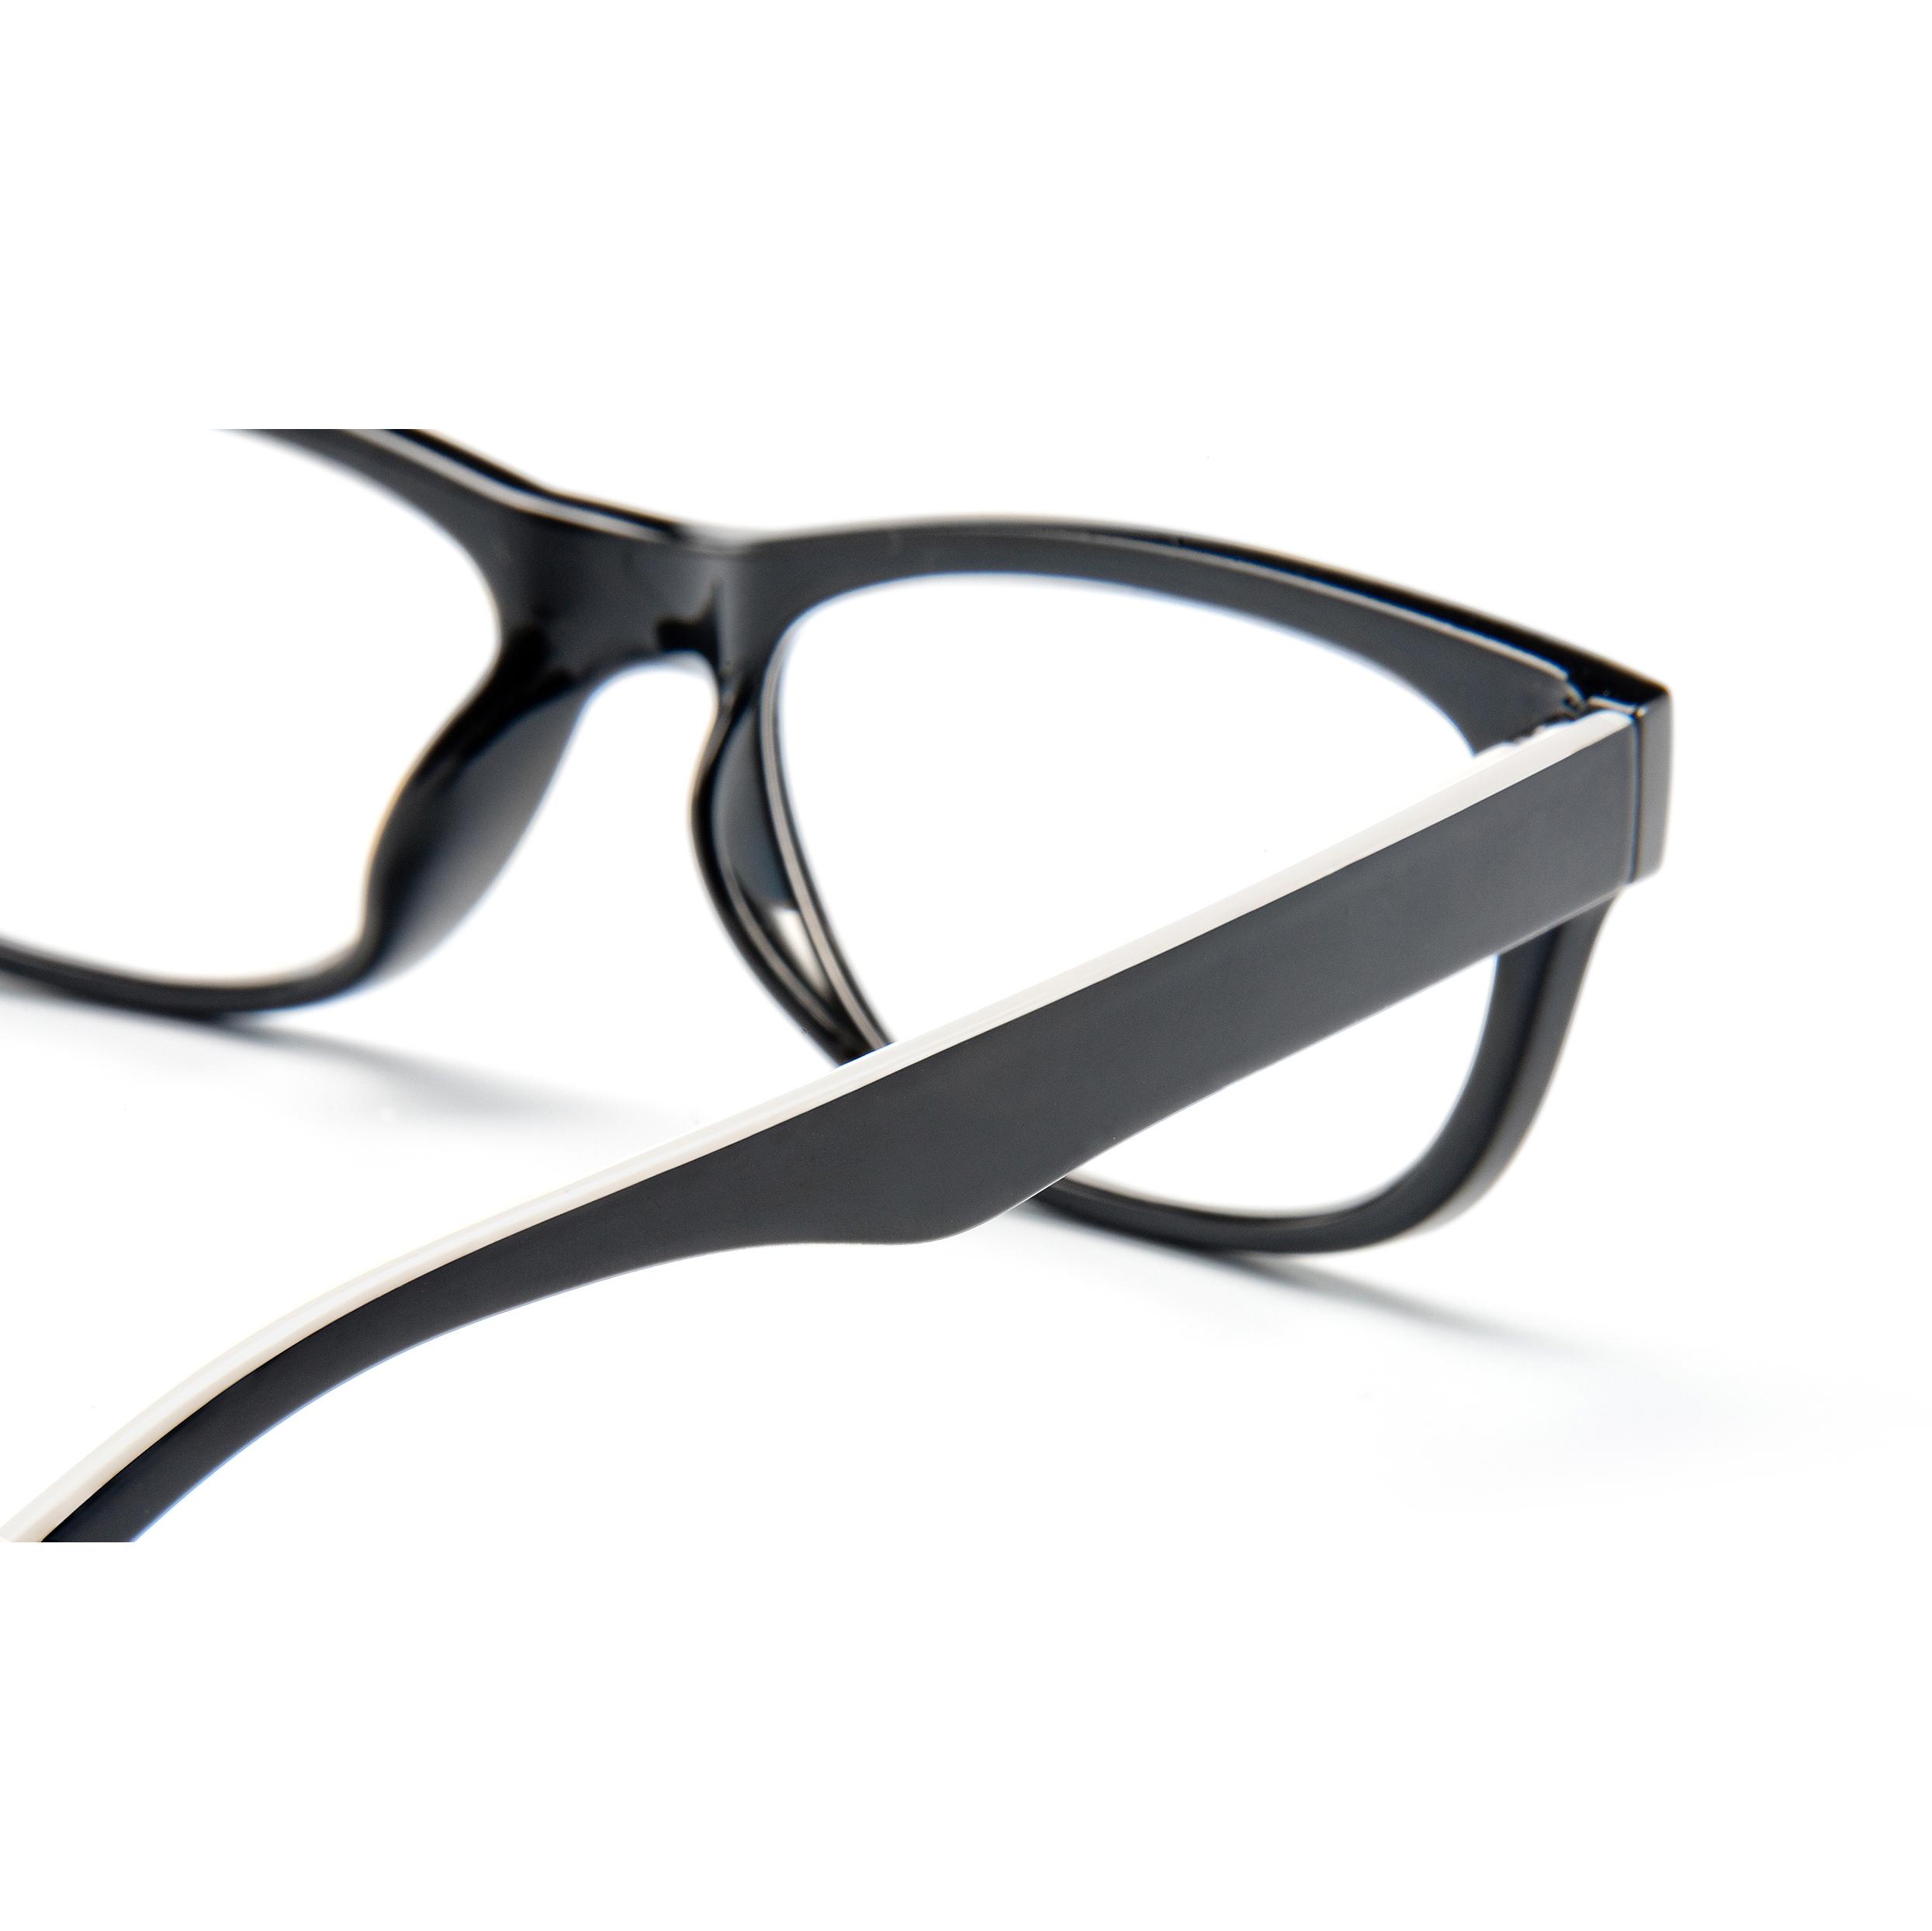 Detailed view frame, reading glasses San Francisco white